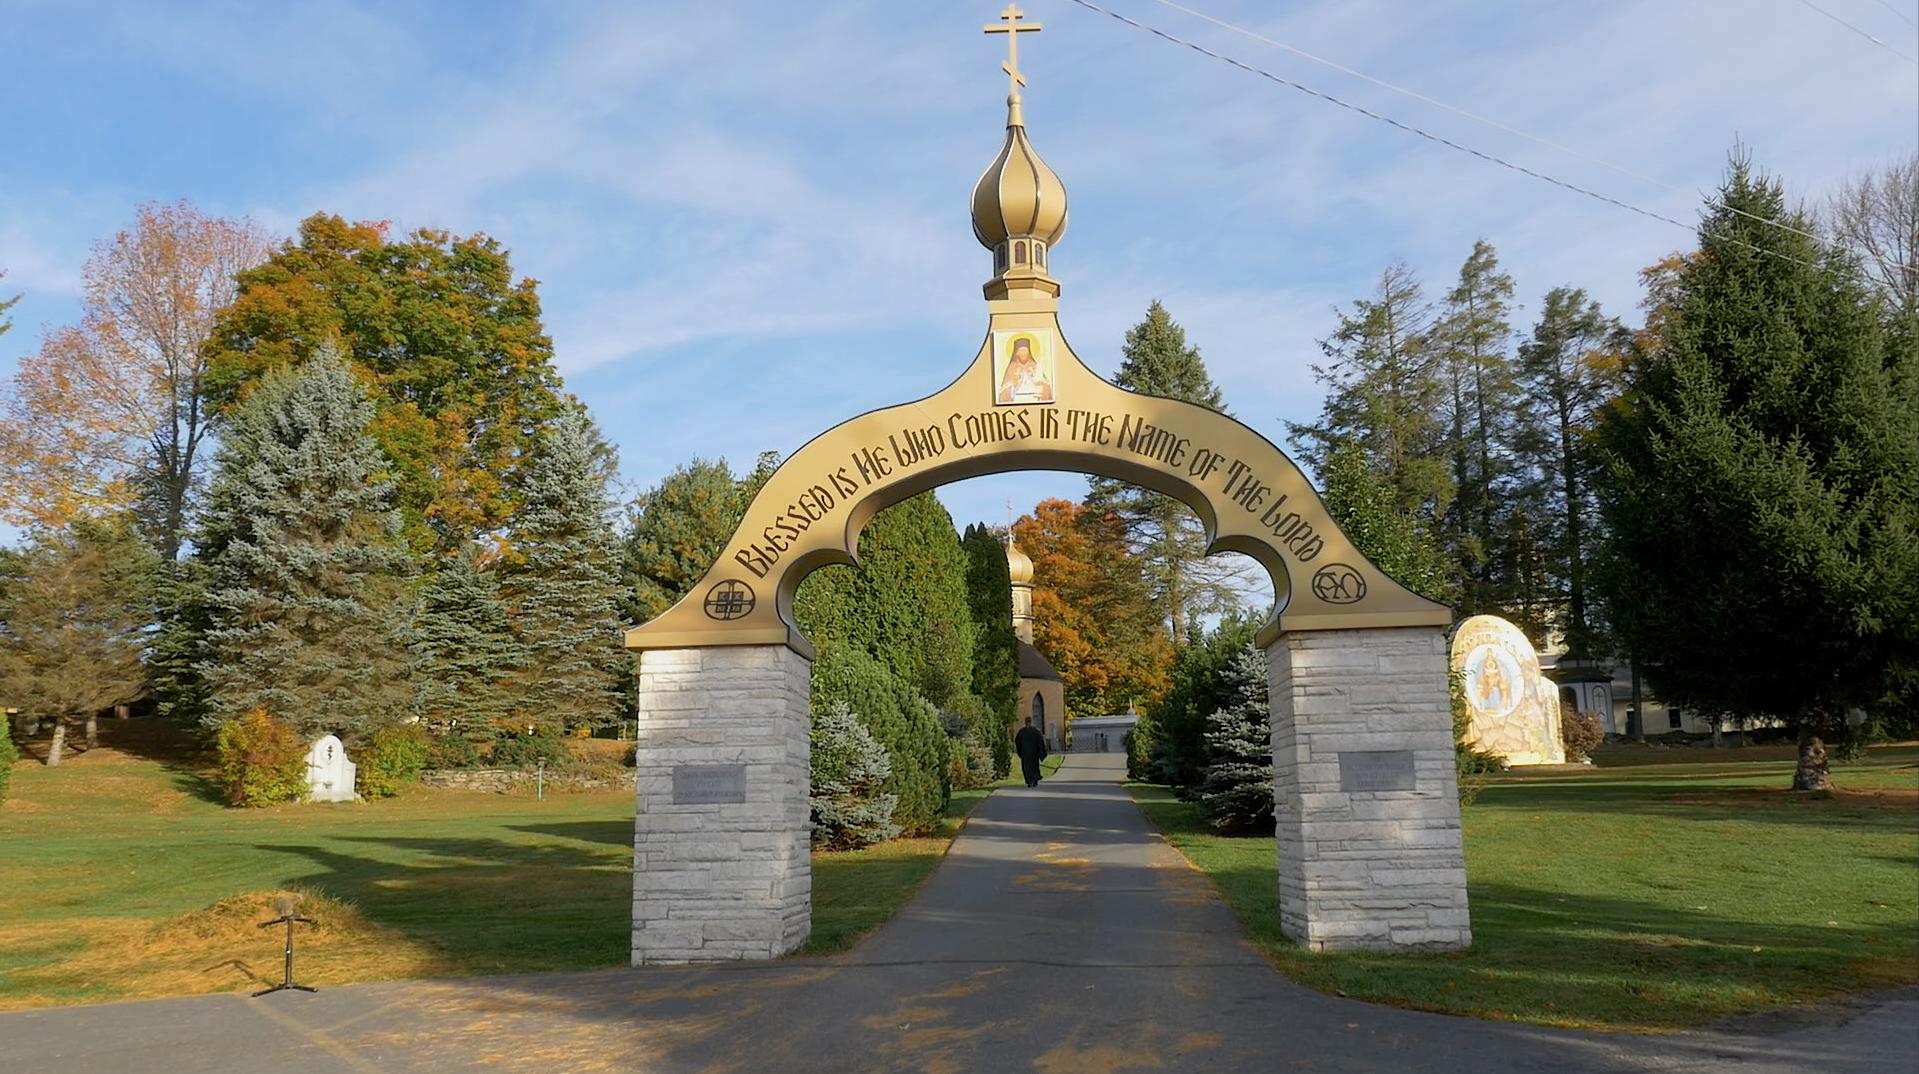 Upcoming events at Saint Tikhon's Orthodox Theological Seminary